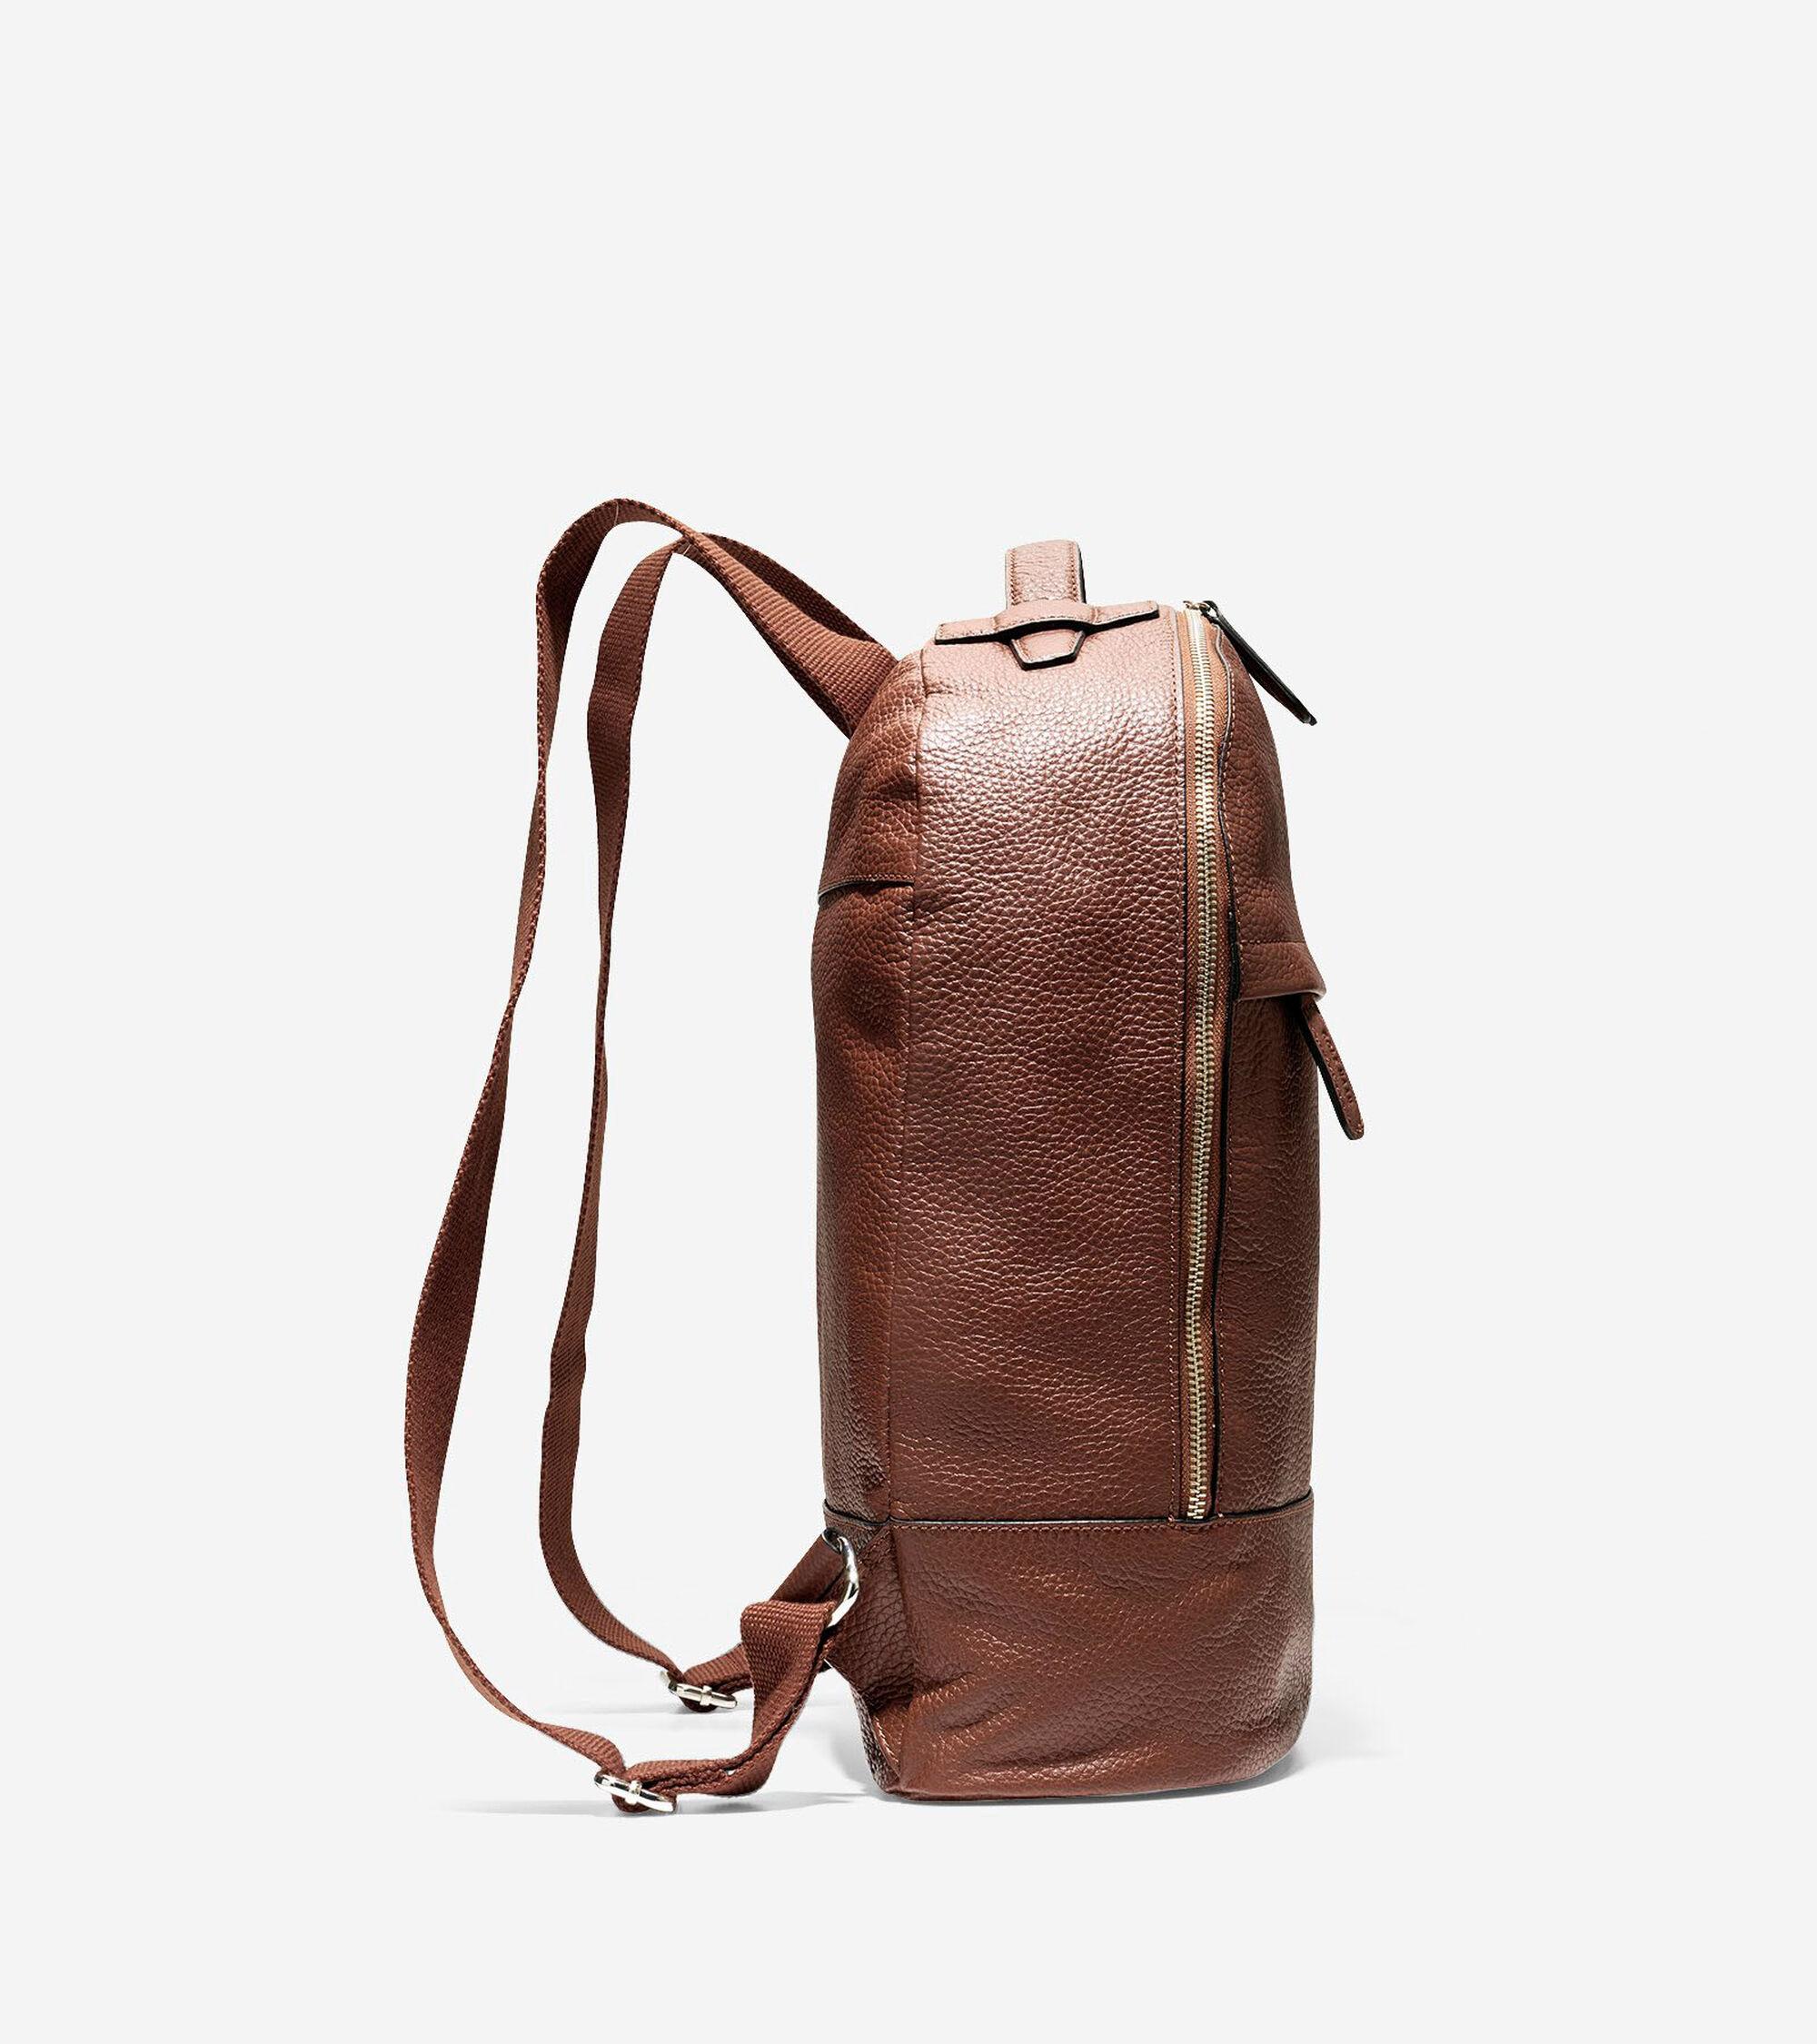 6ed72874813a Barrington Backpack  Barrington Backpack  Barrington Backpack ...